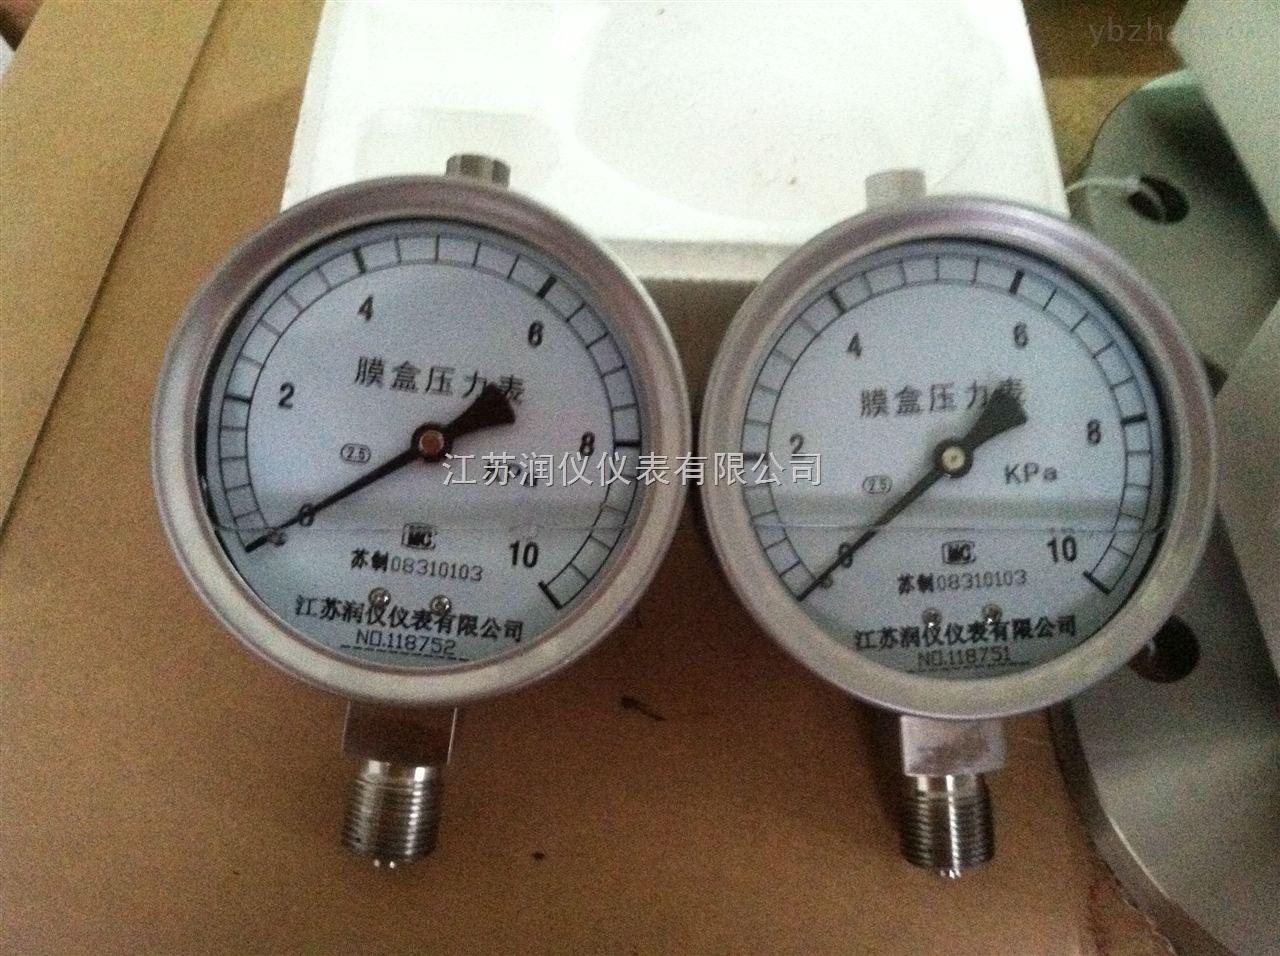 YEN-100 江蘇潤儀10KPa耐震膜盒壓力表